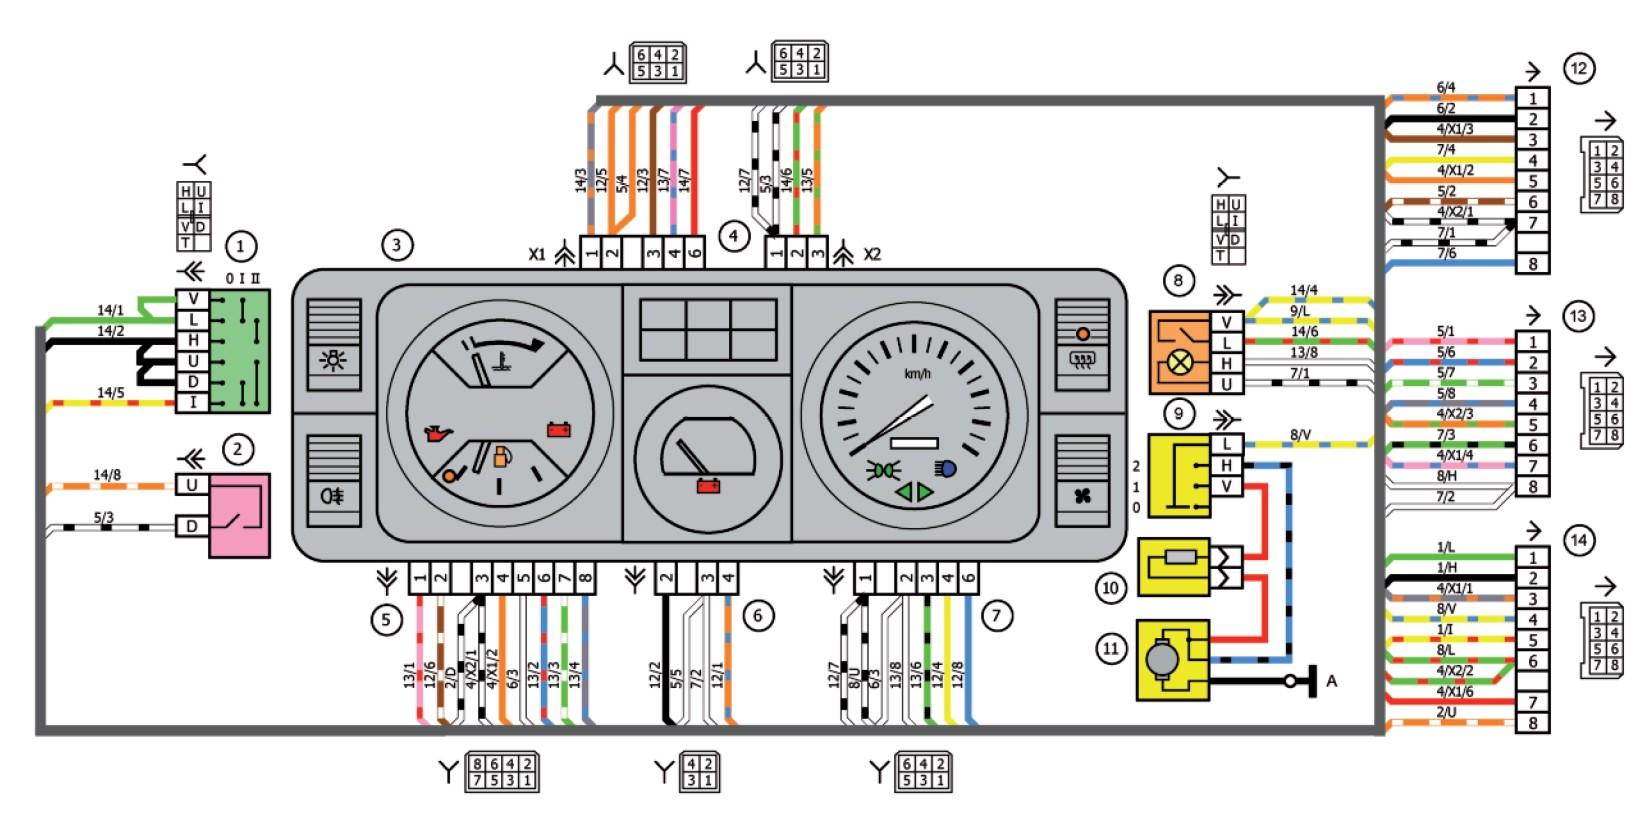 Электронная схема зарядно-пускового устройства